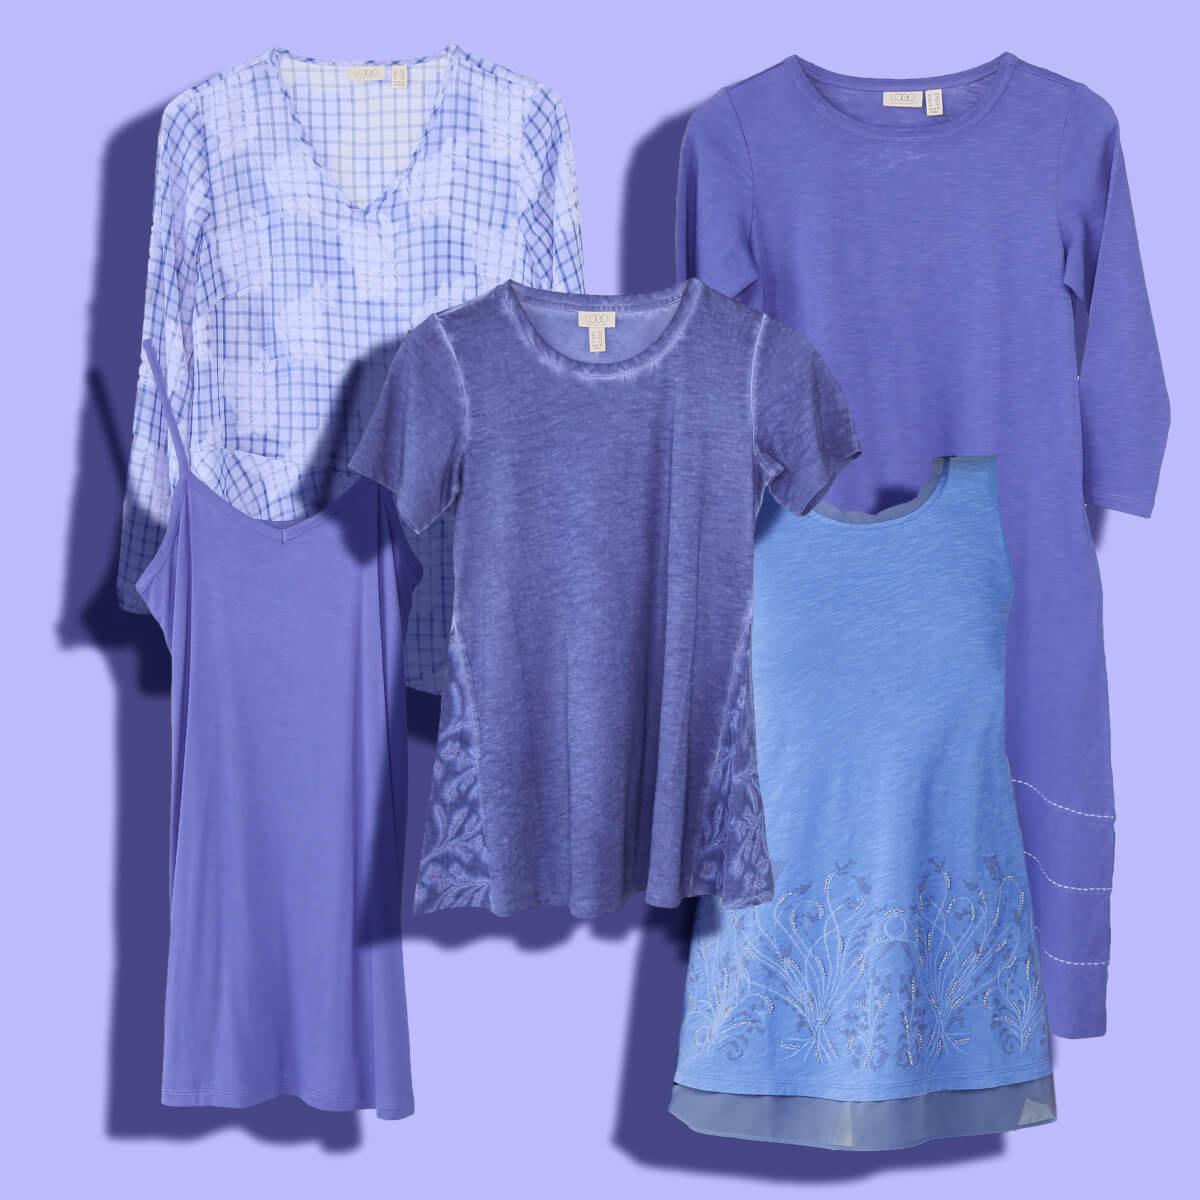 Color Crush: Blue Violets